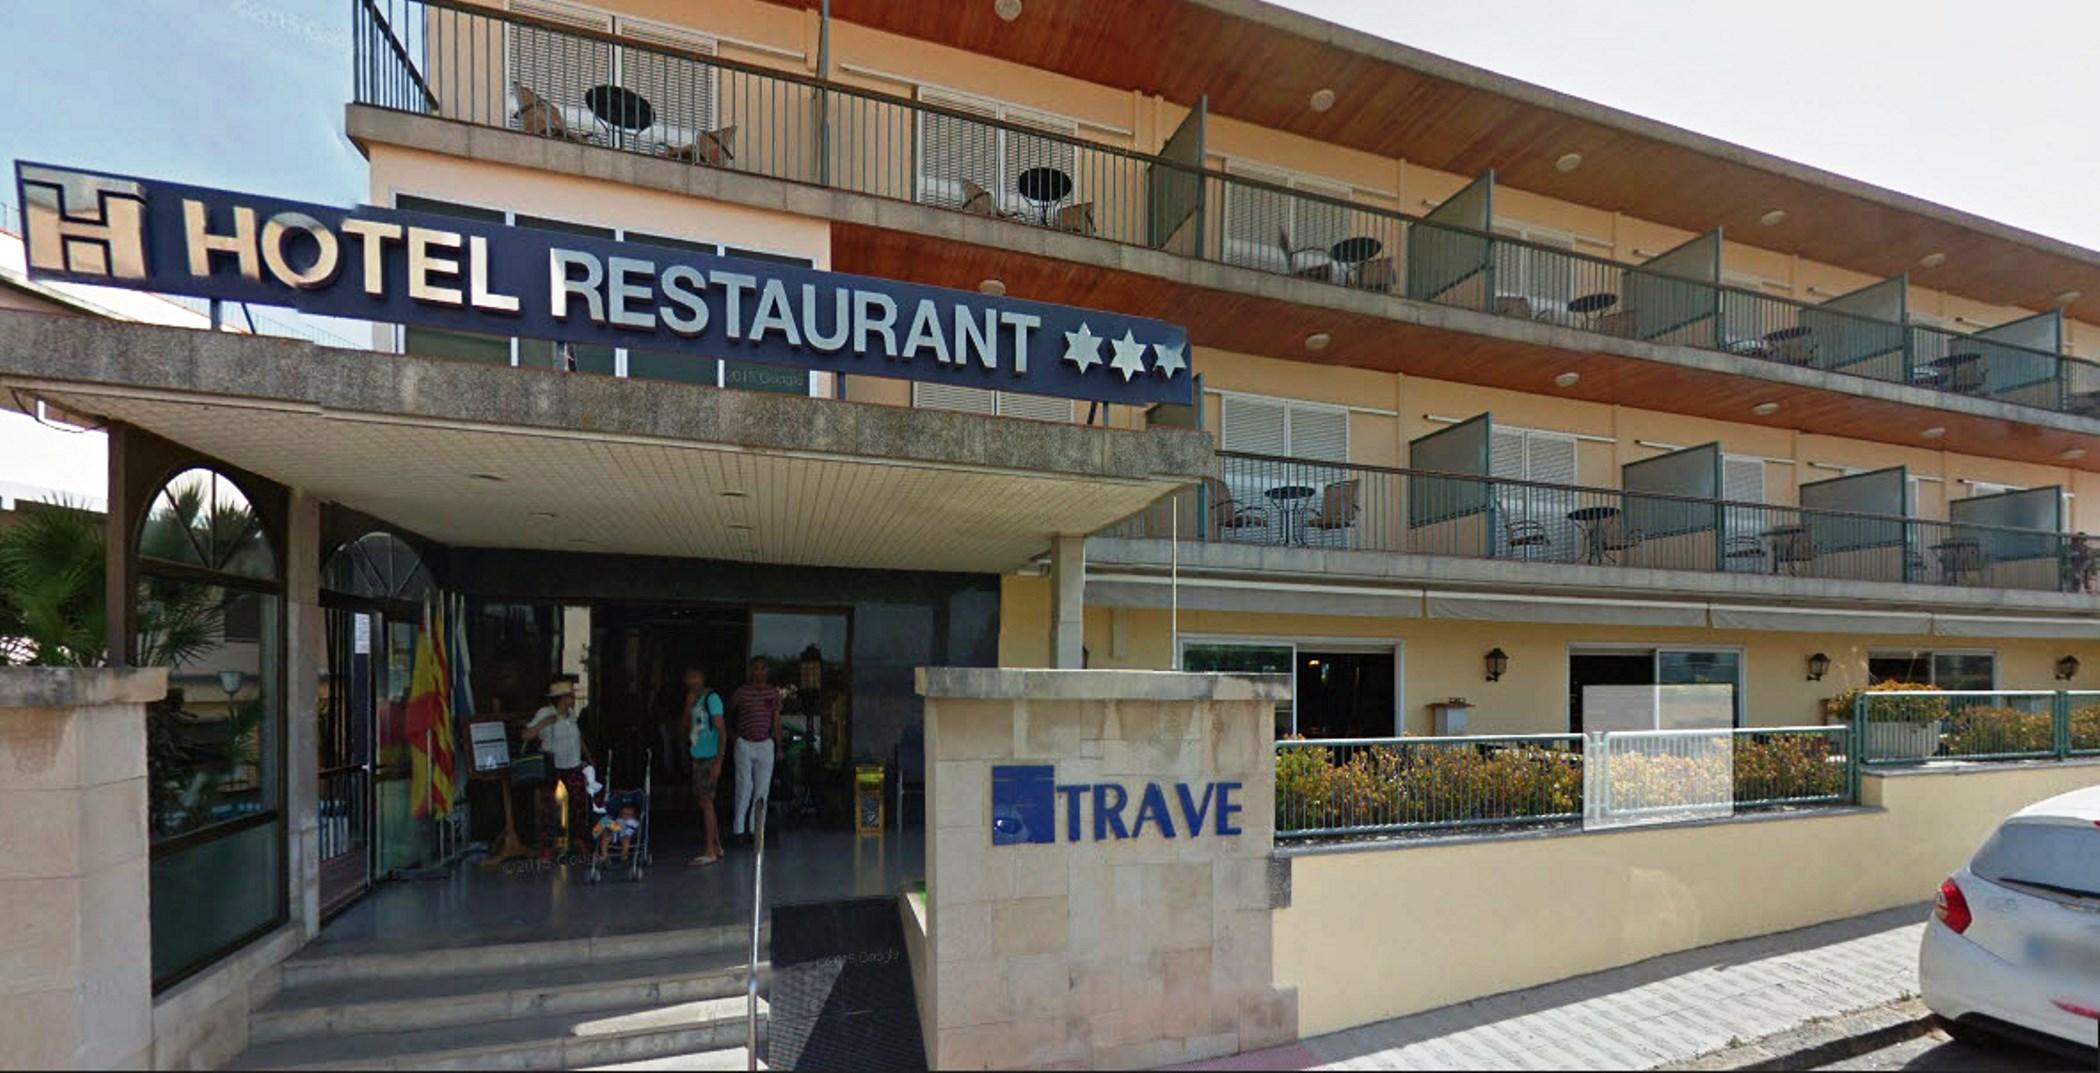 Trave, Girona